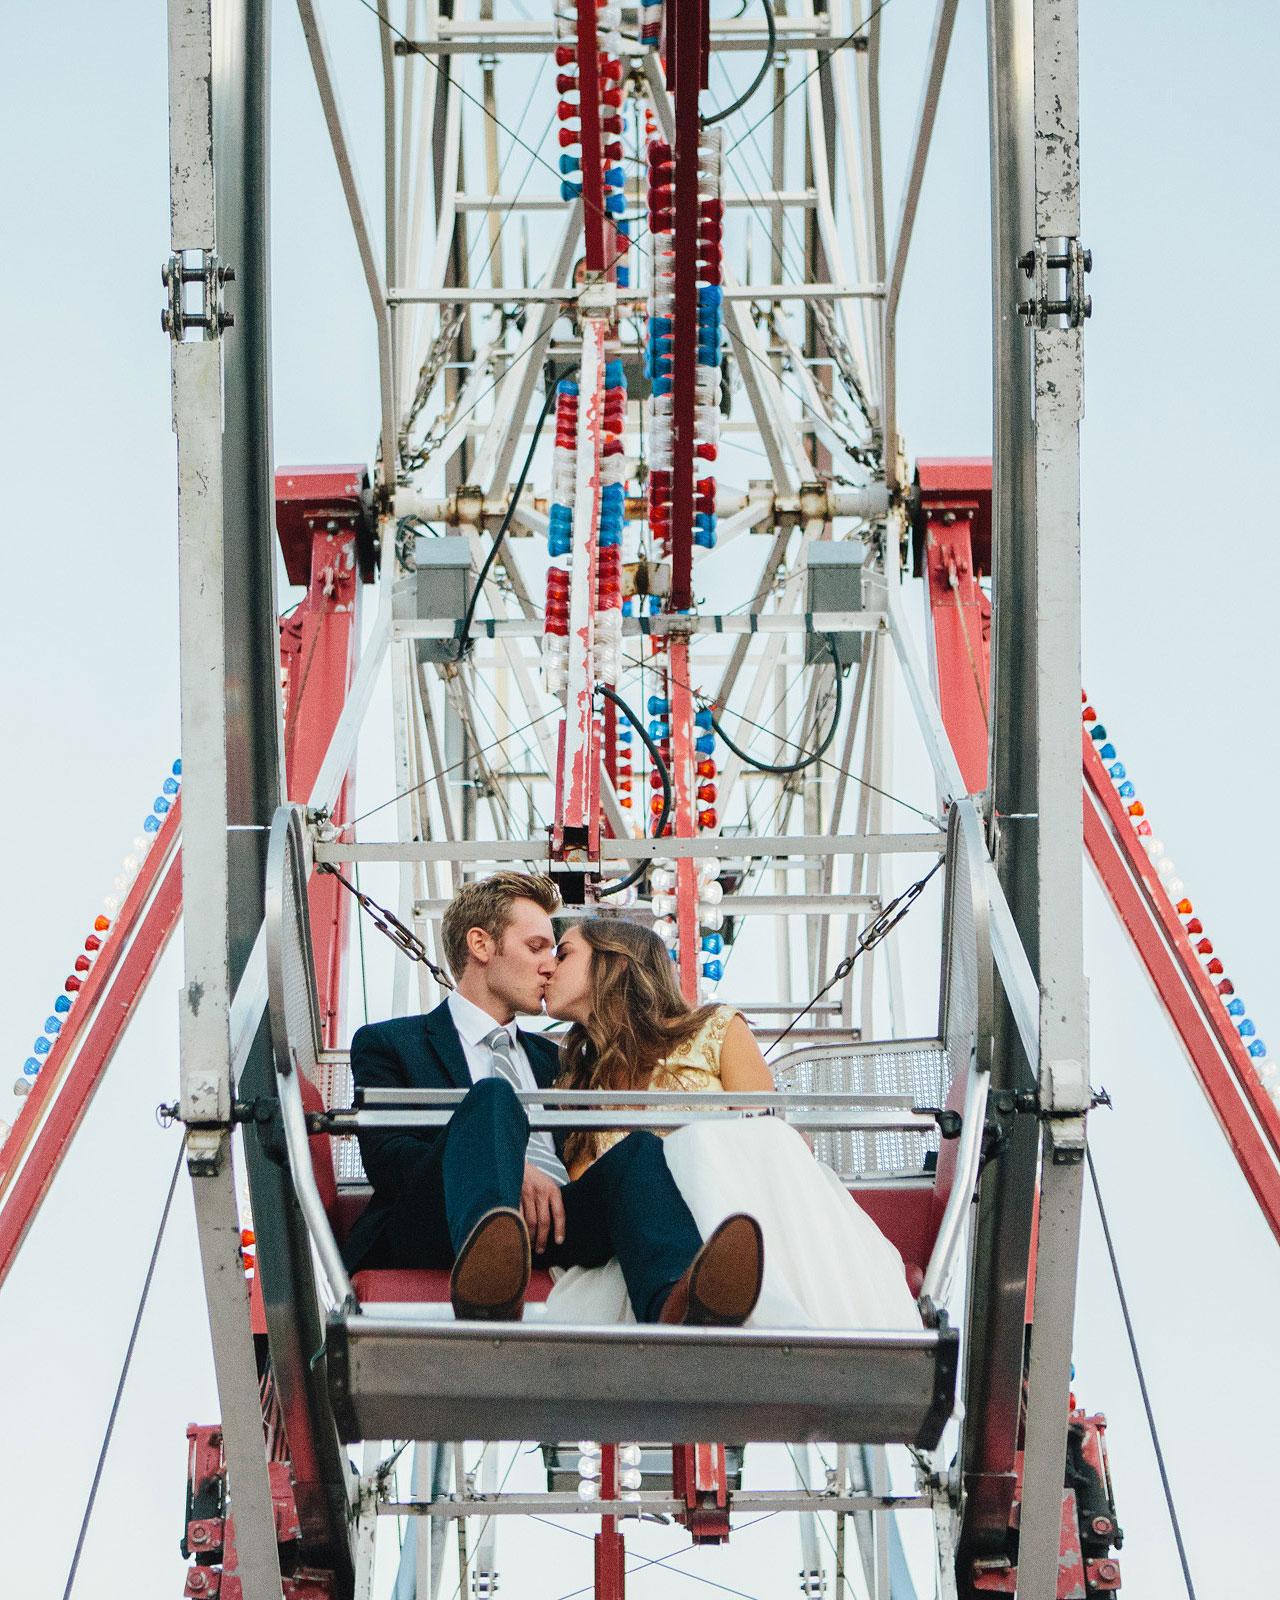 mackenzie-boman-wedding-ferriswheel-228-s112693-0316.jpg